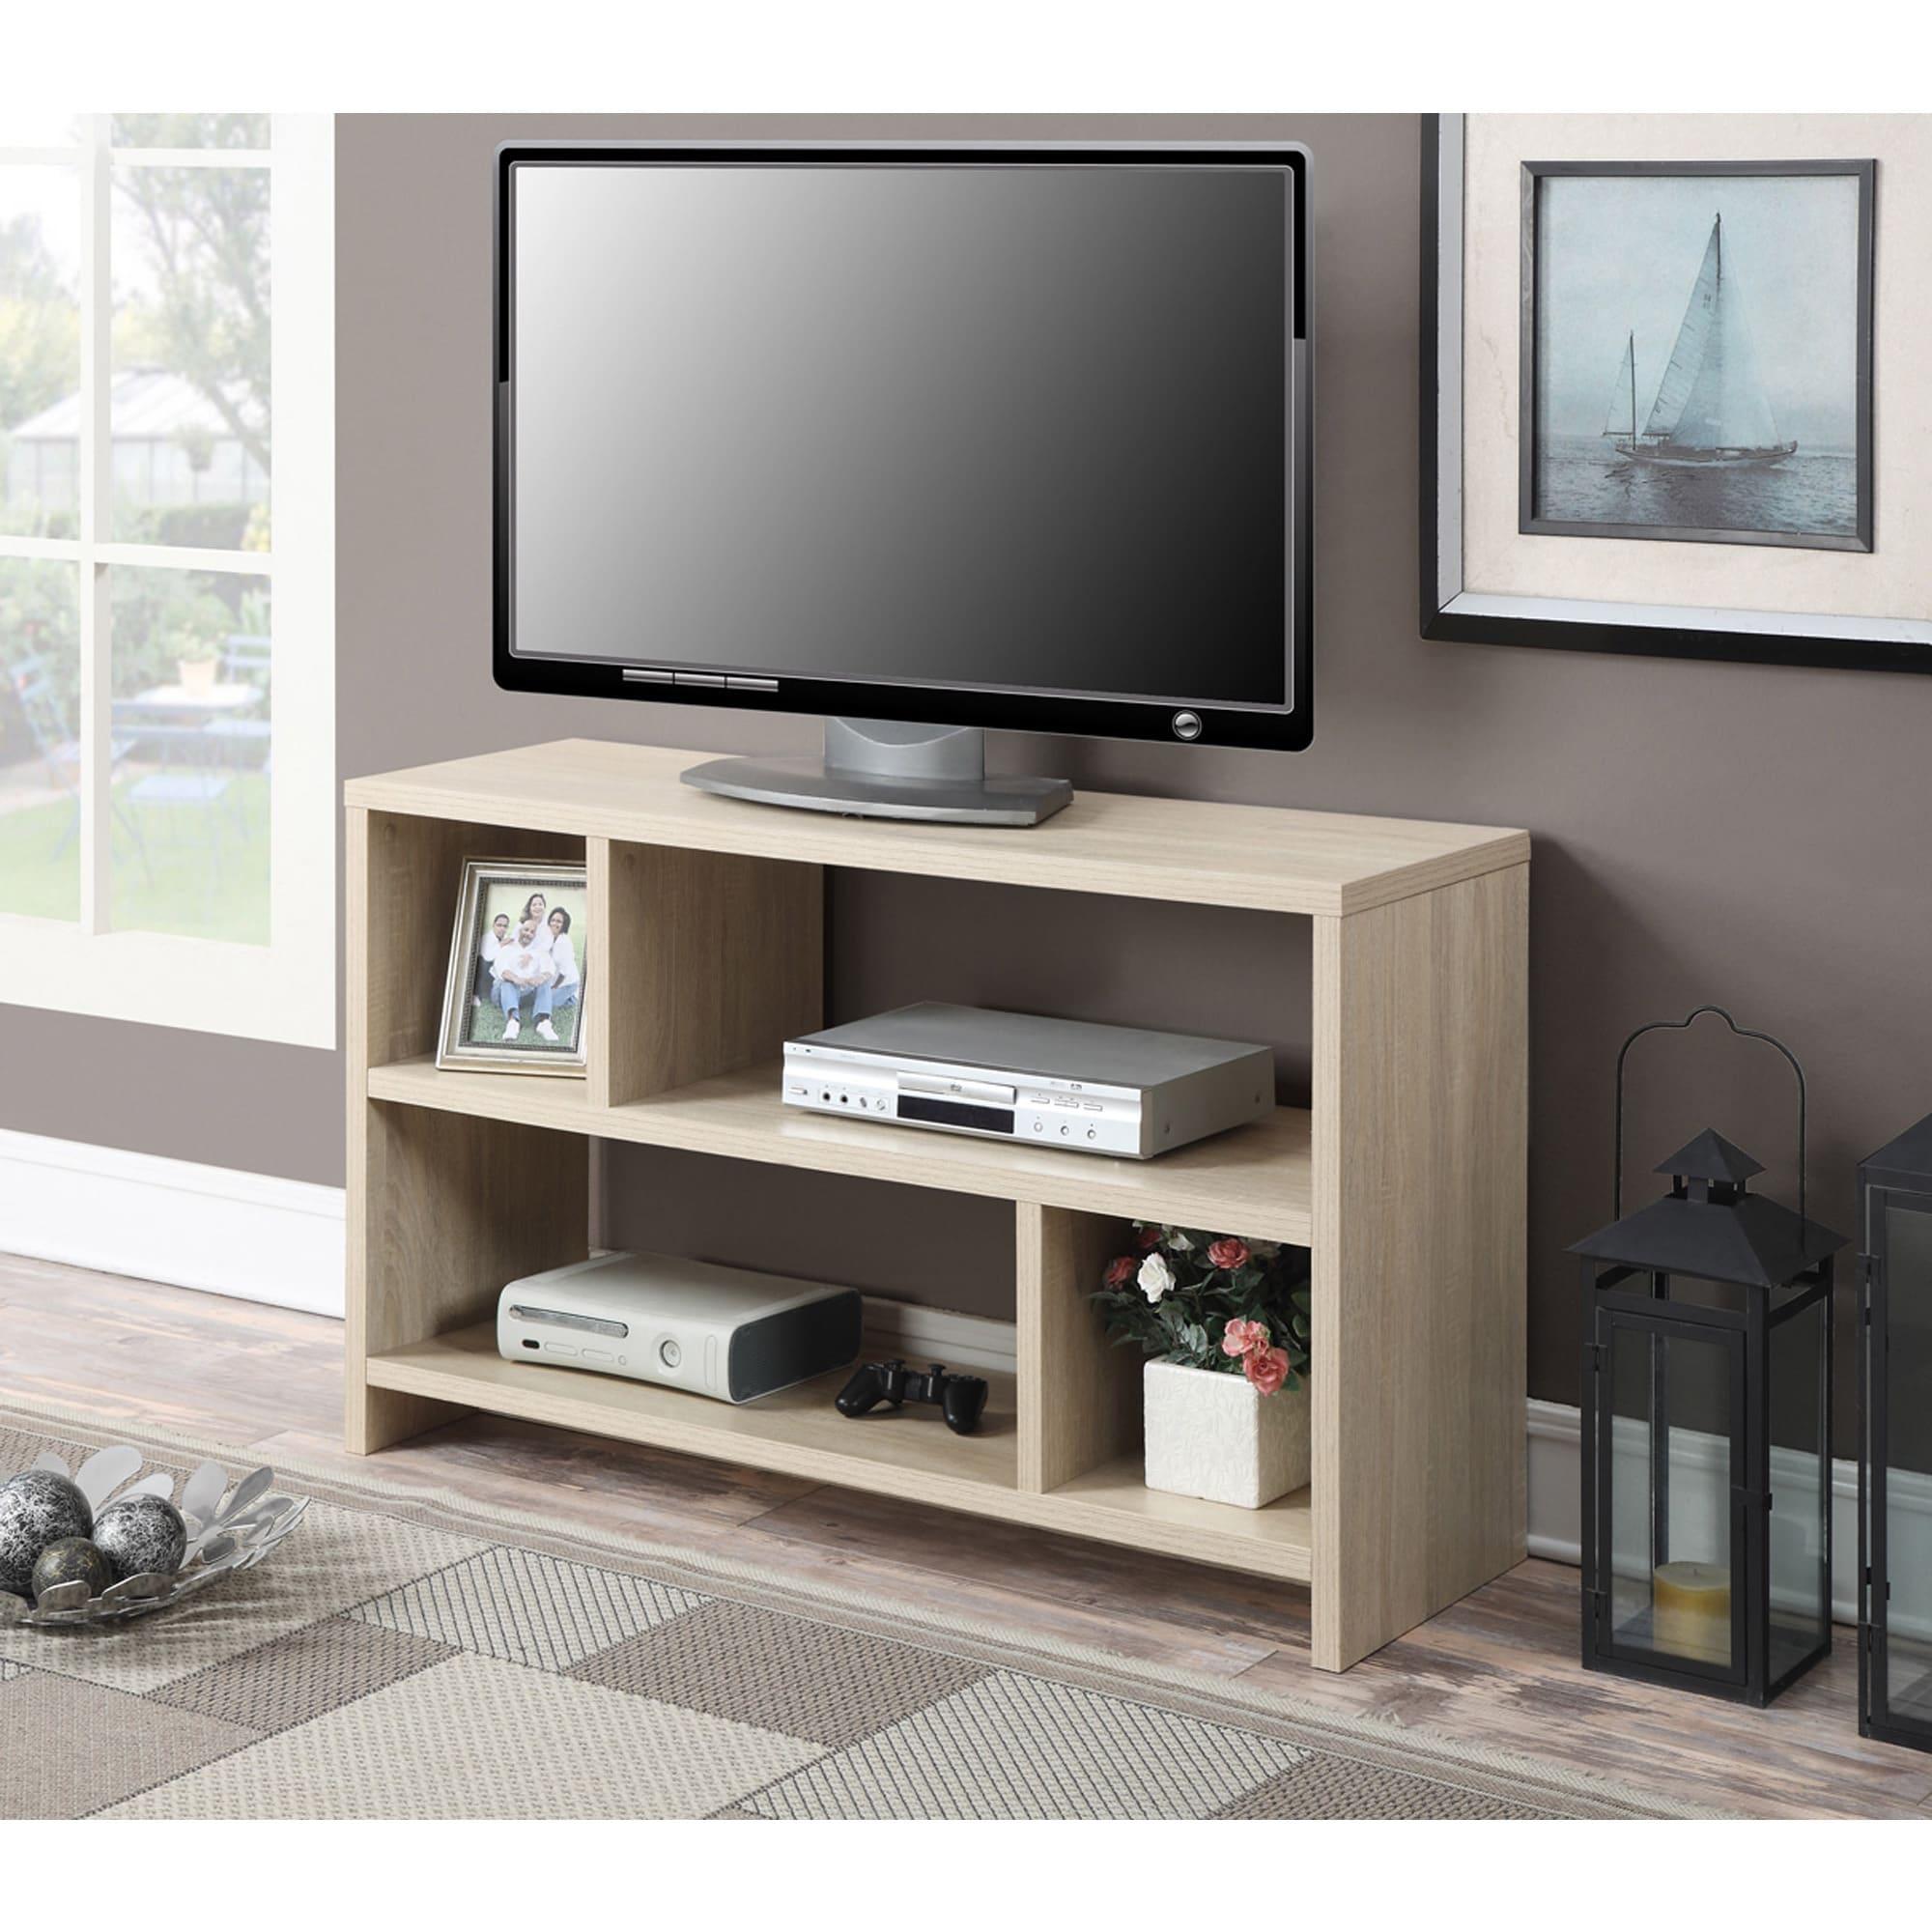 Porch & Den Robertson TV Stand Console (Cherry Finish - Cherry)